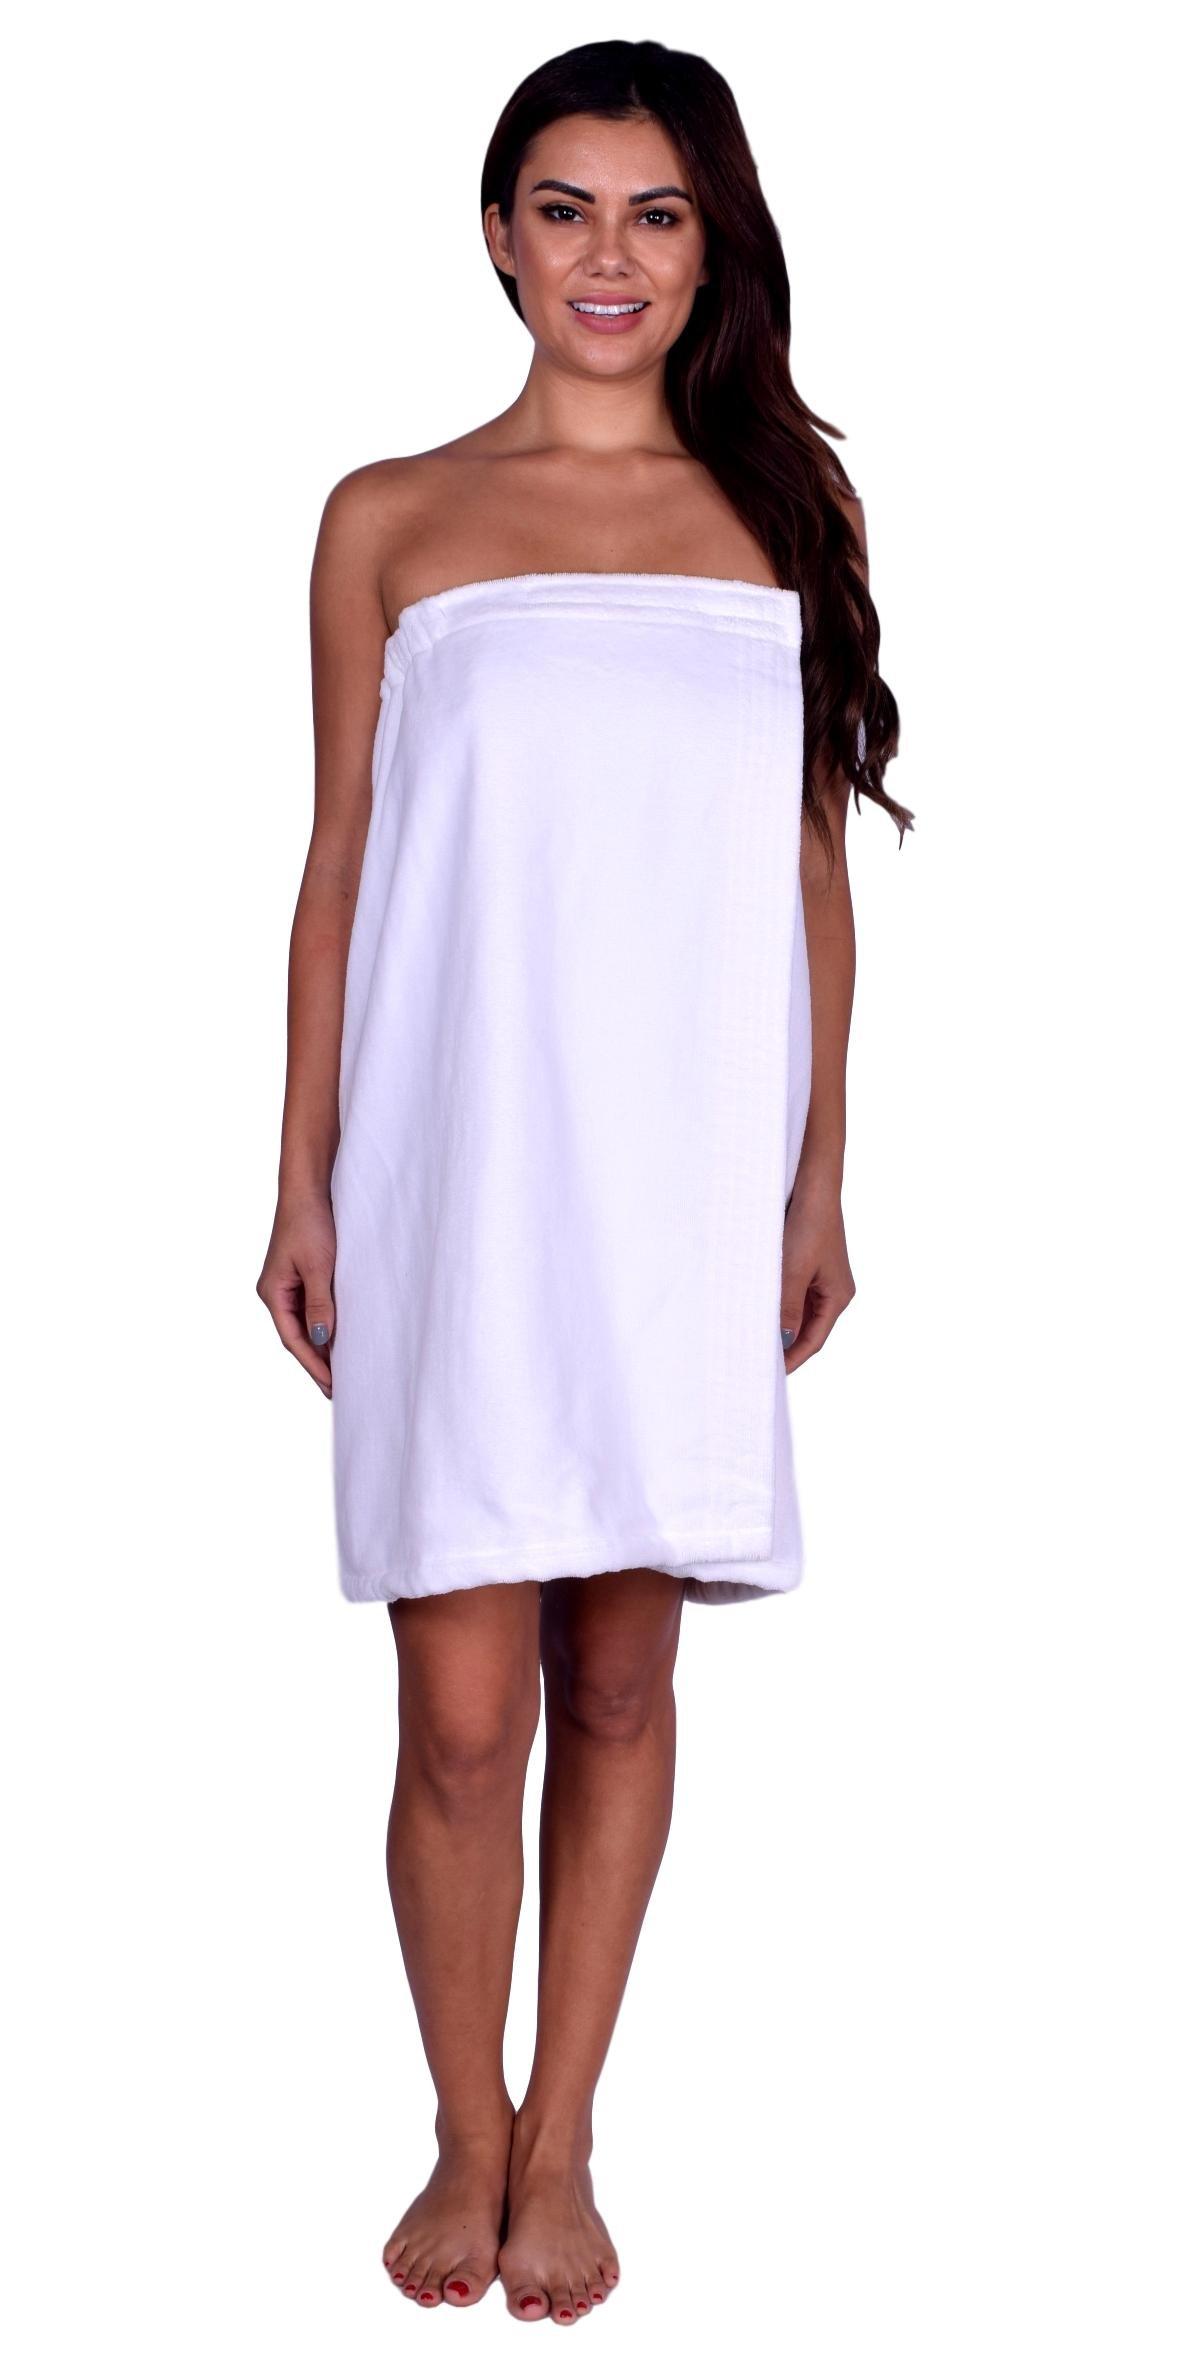 La Calla Women's Bath Wrap -%100 Terry Cotton - Turkish Spa Shower Women Wraps with Adjustable Closure (White)